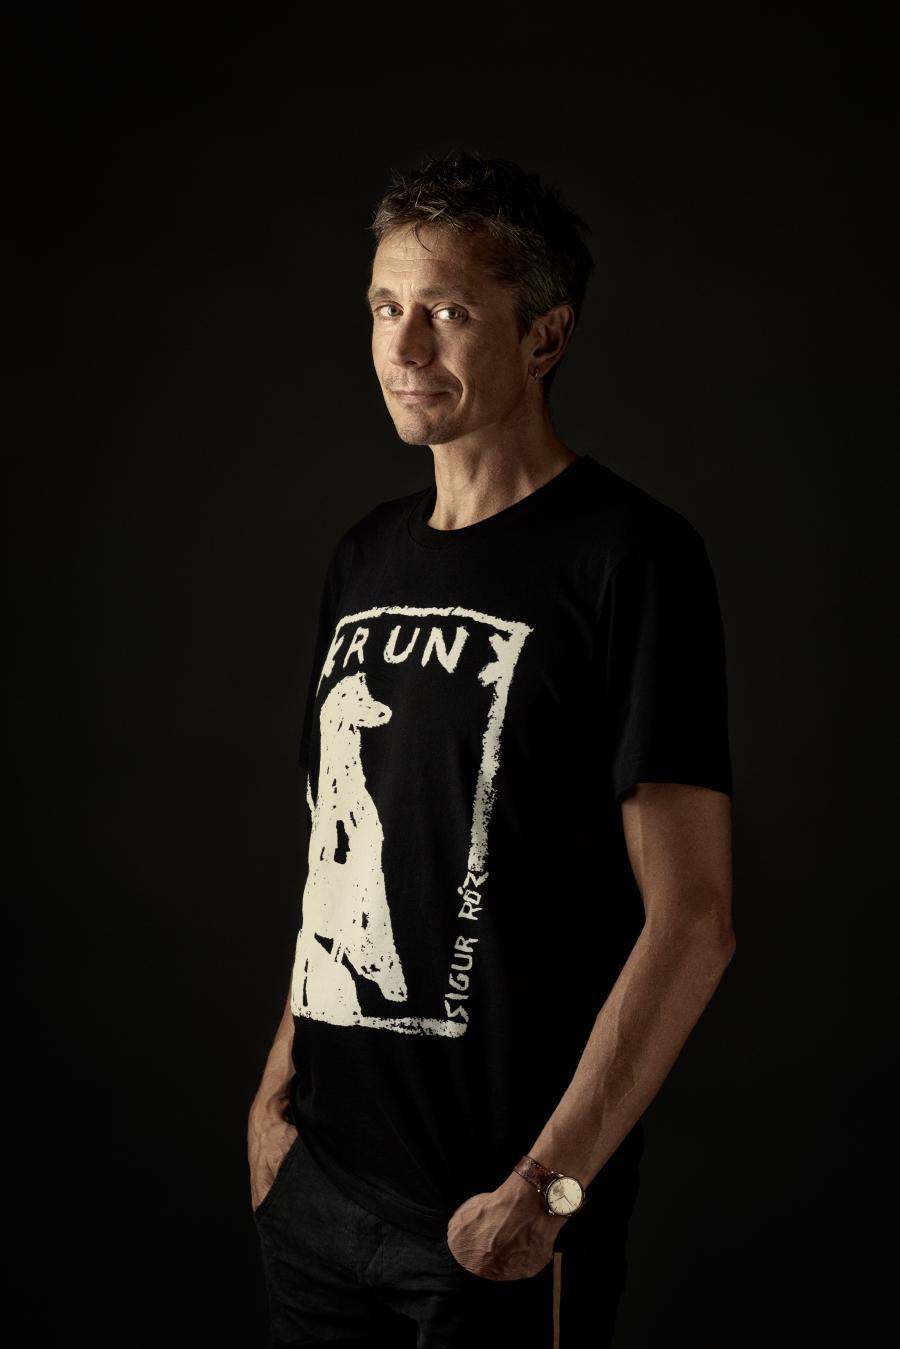 Søren R Fauth